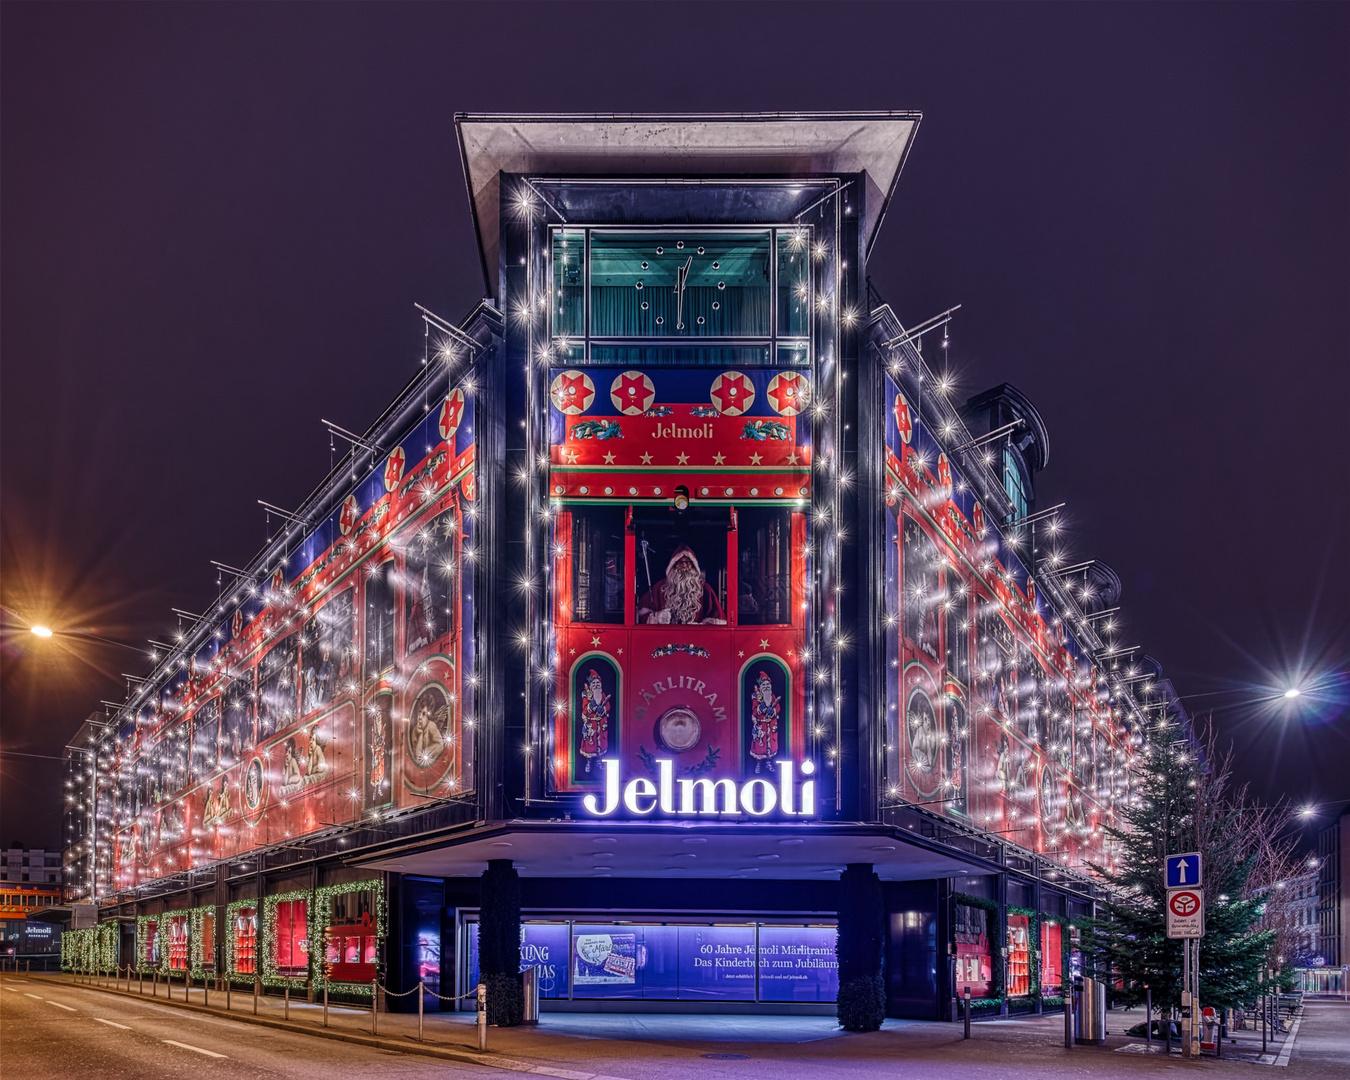 20181229_Zuerich_Seidengasse_Jelmoli